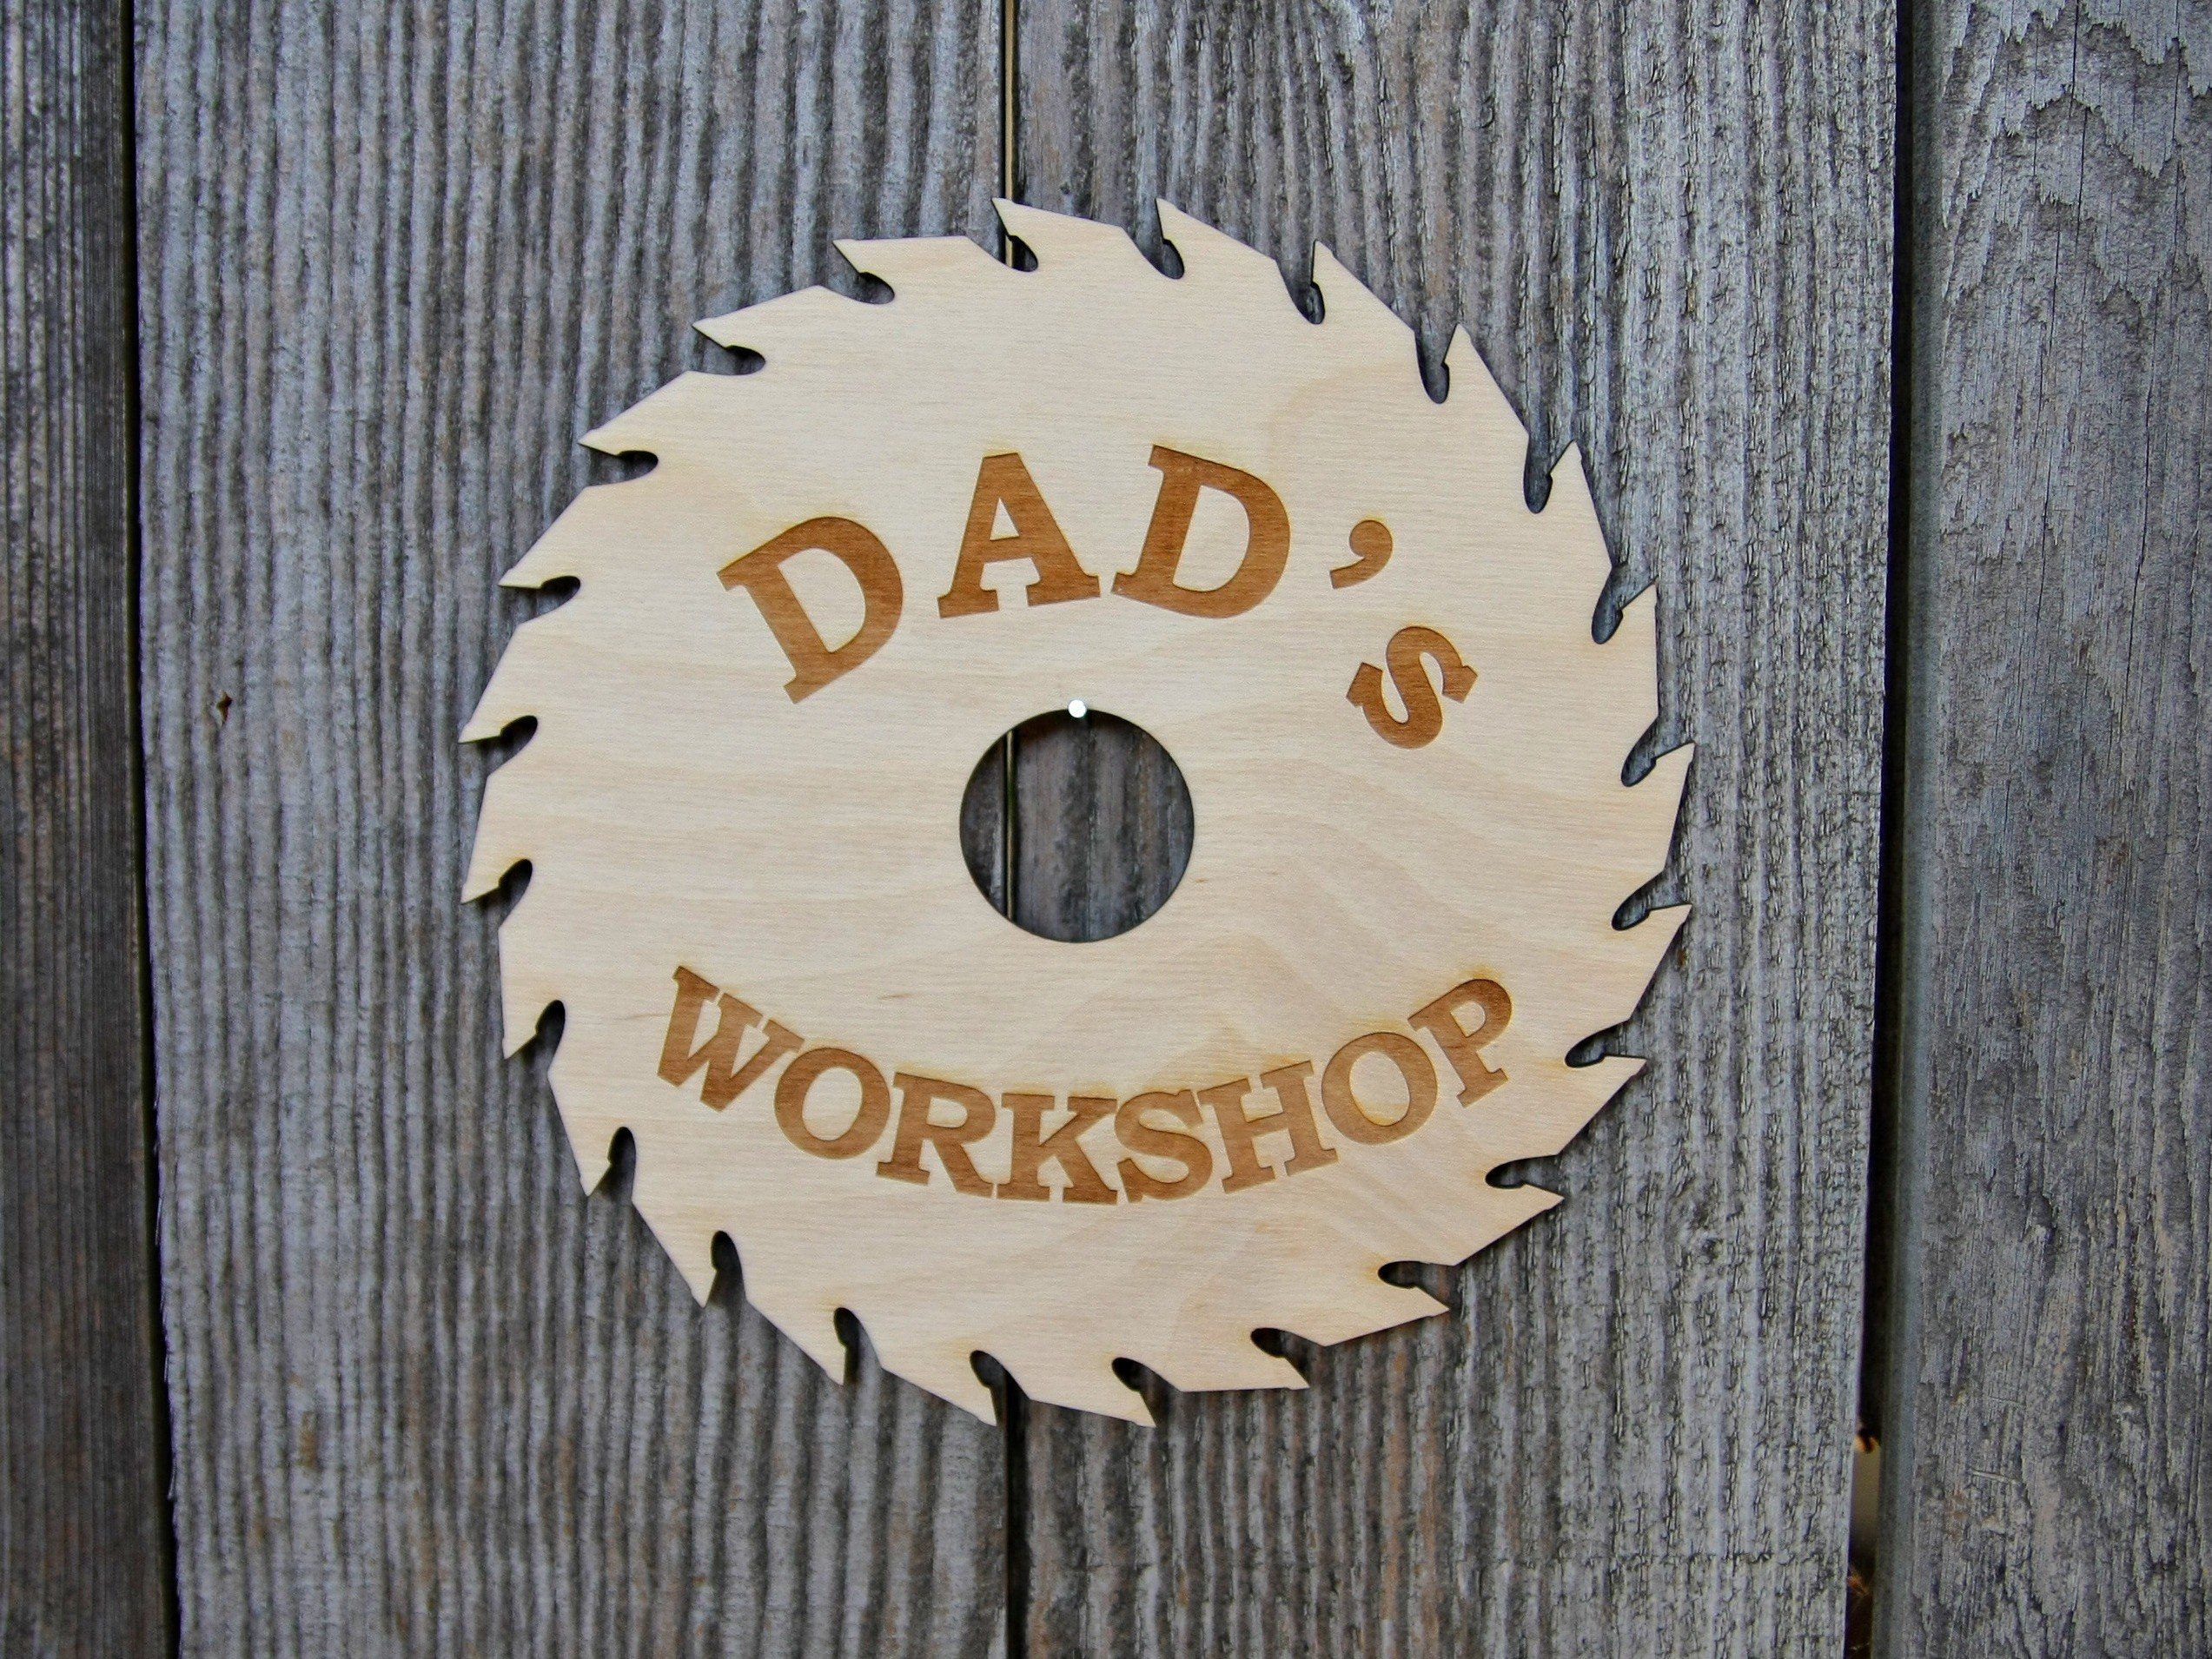 Dads workshop saw sign personalized wood garage sign custom papas